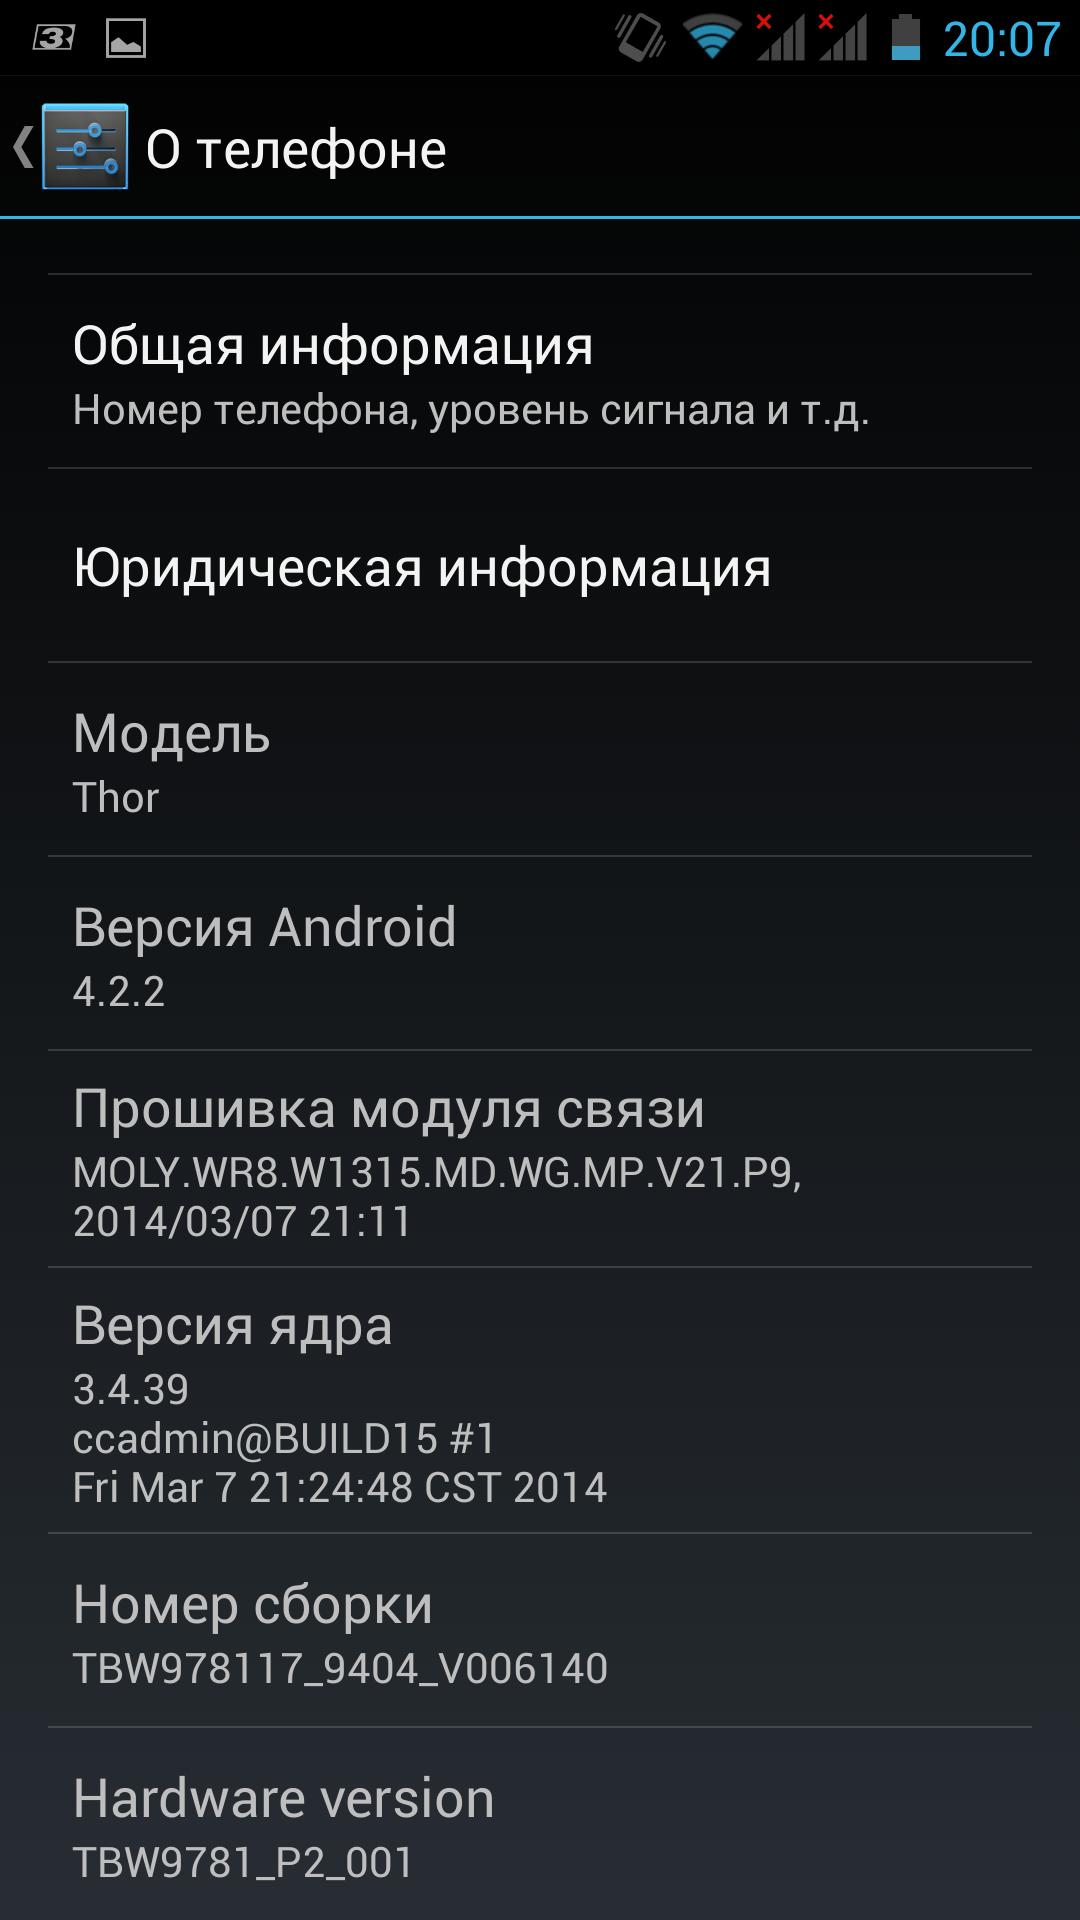 Screenshot_2014-07-11-20-07-14